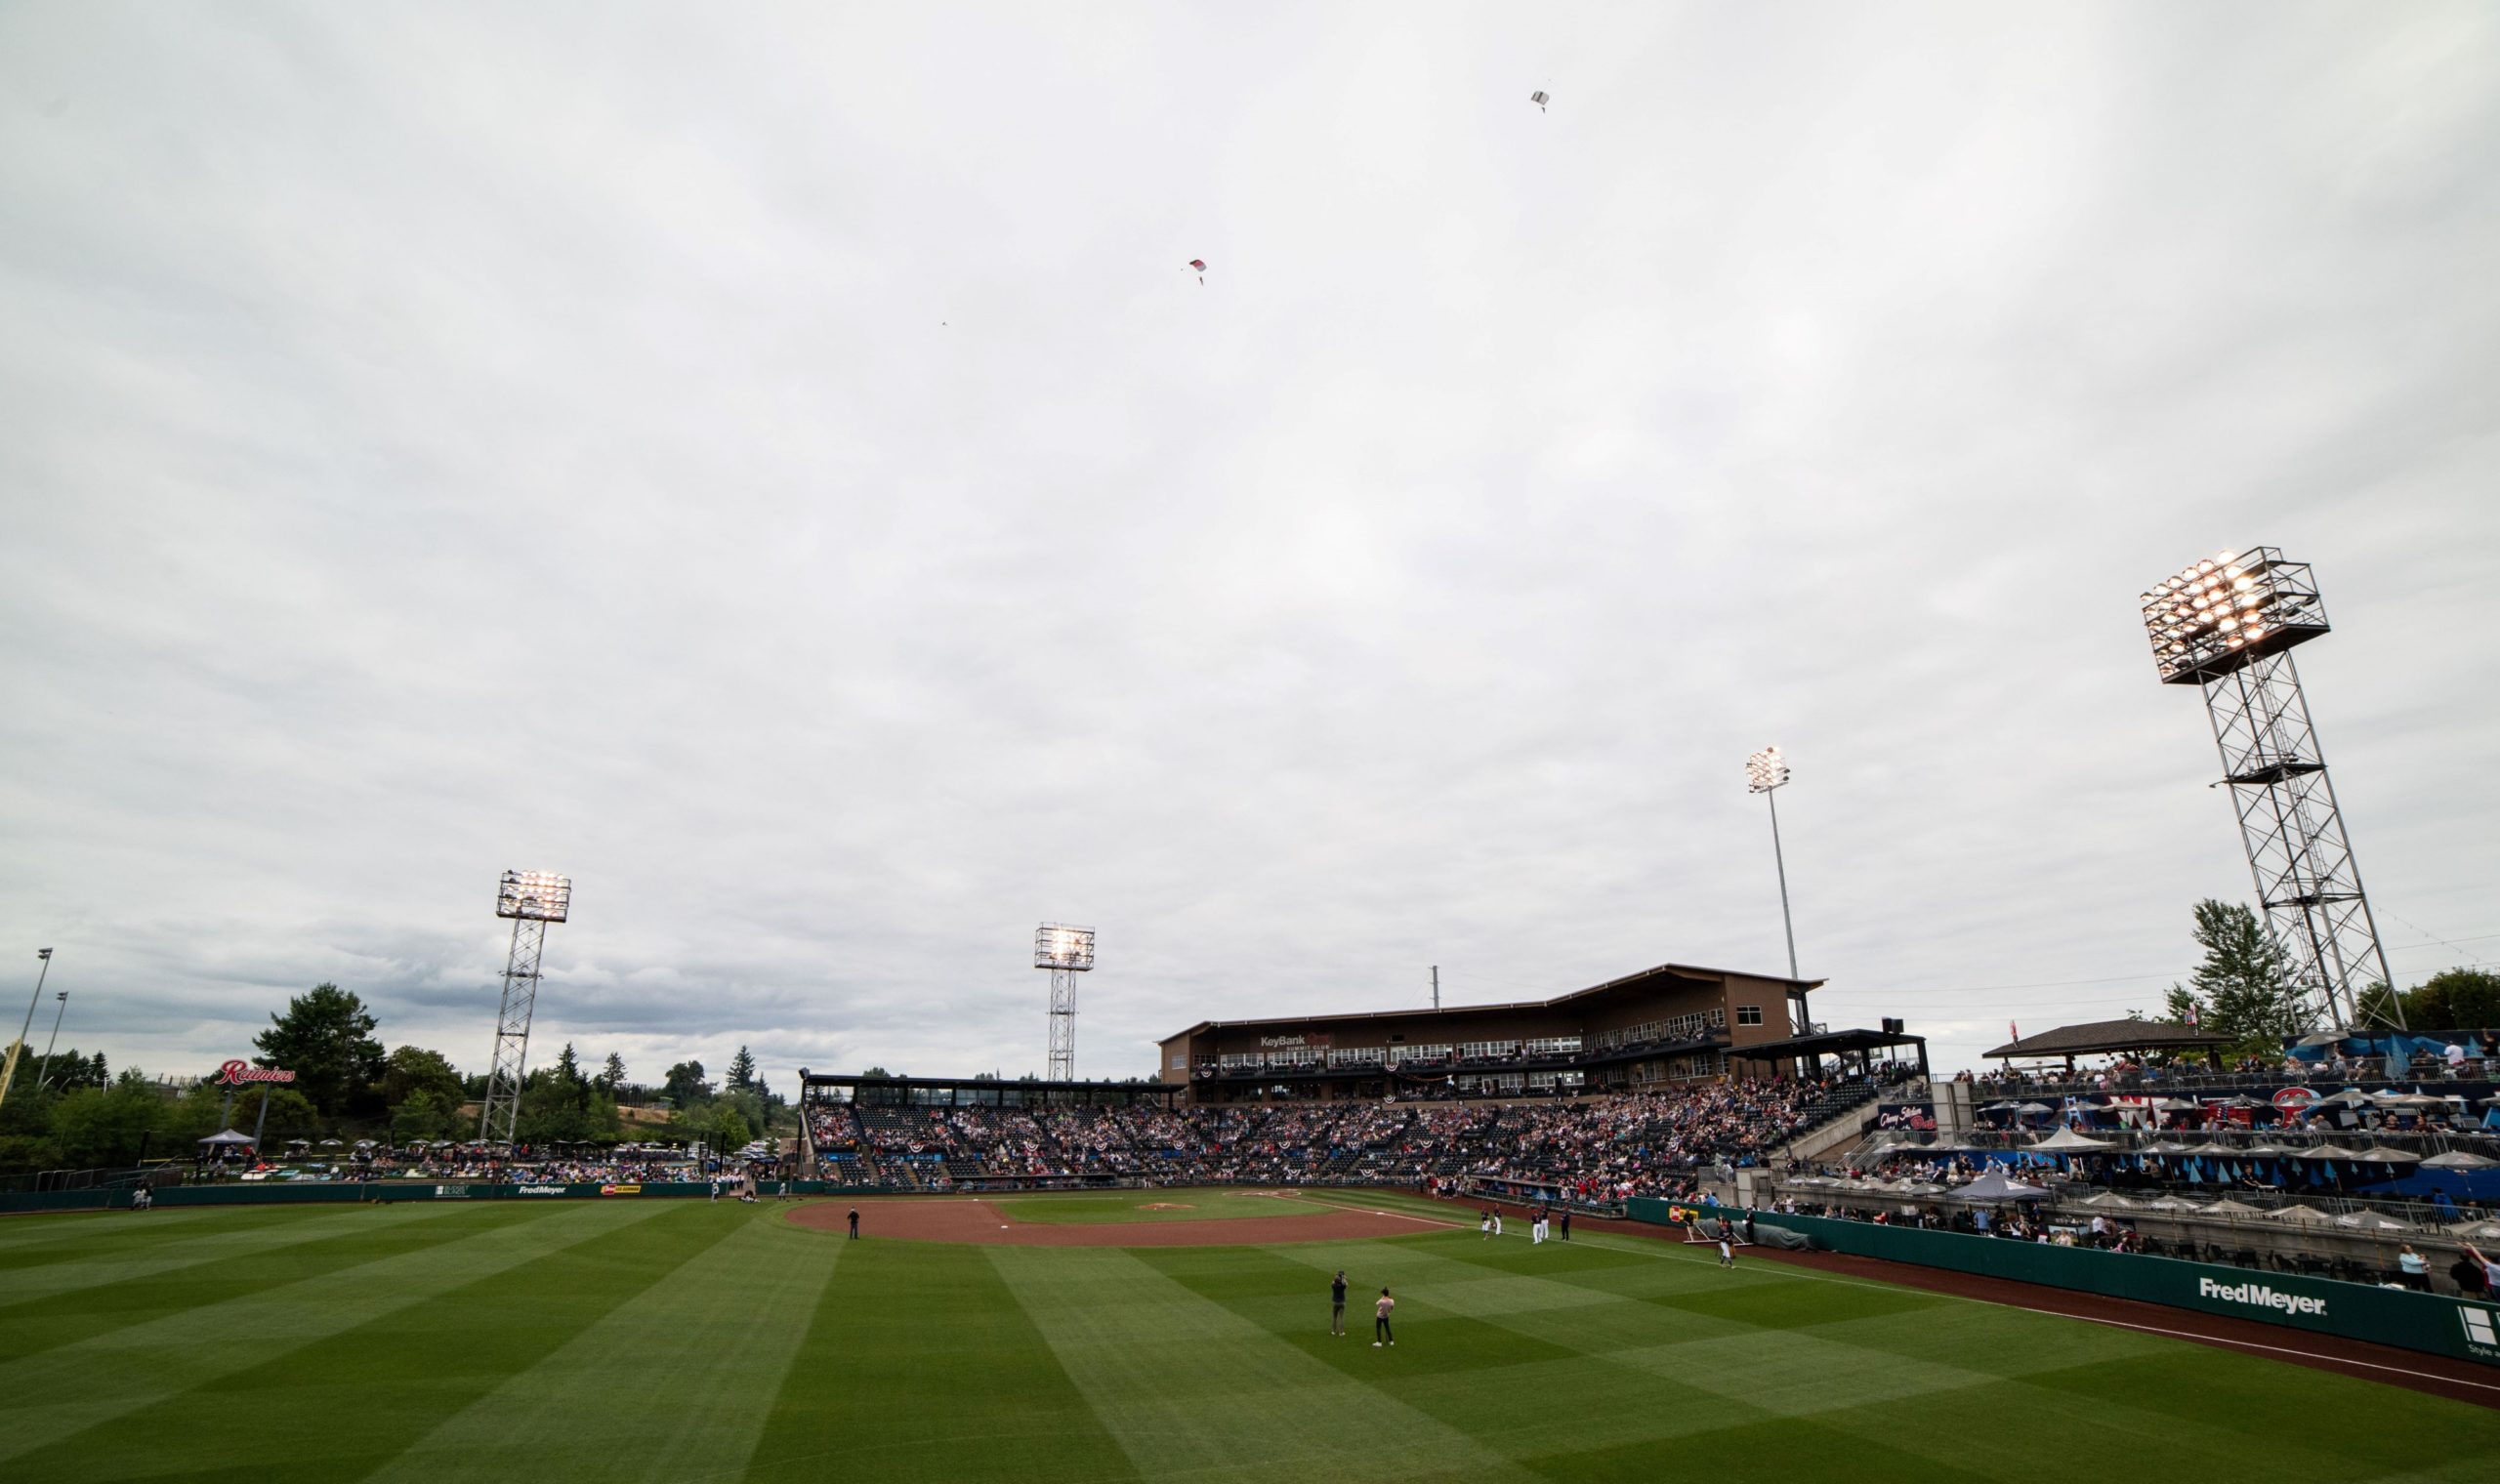 Tacoma Rainiers take the field at Cheney Stadium